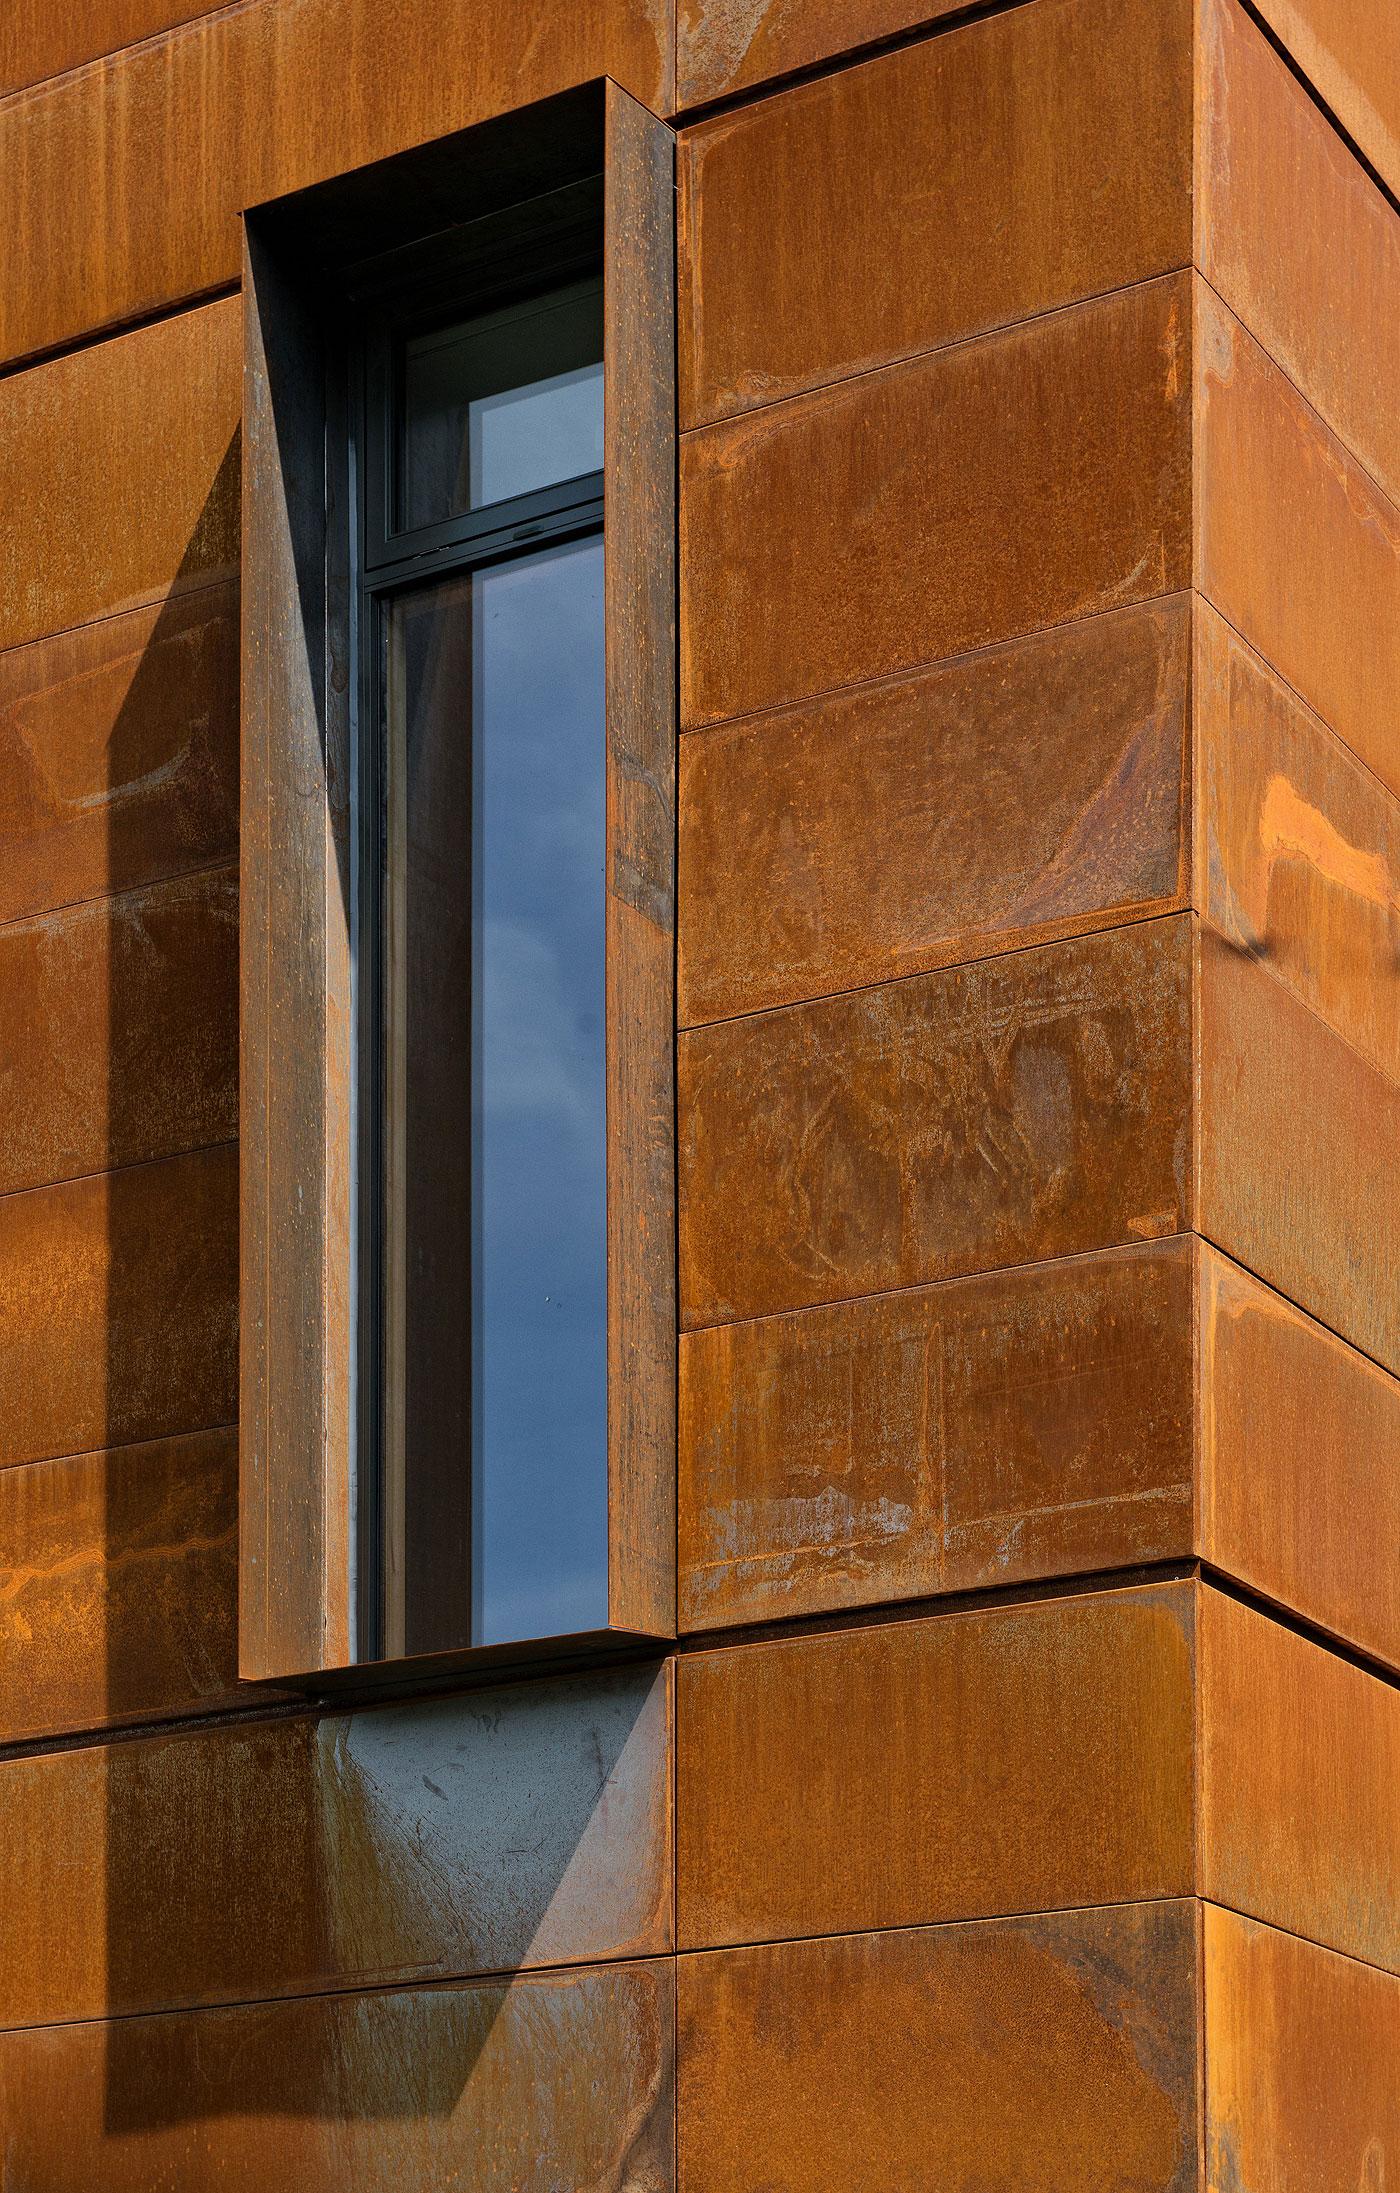 residencia-heathdale-tact-architecture-design (11)